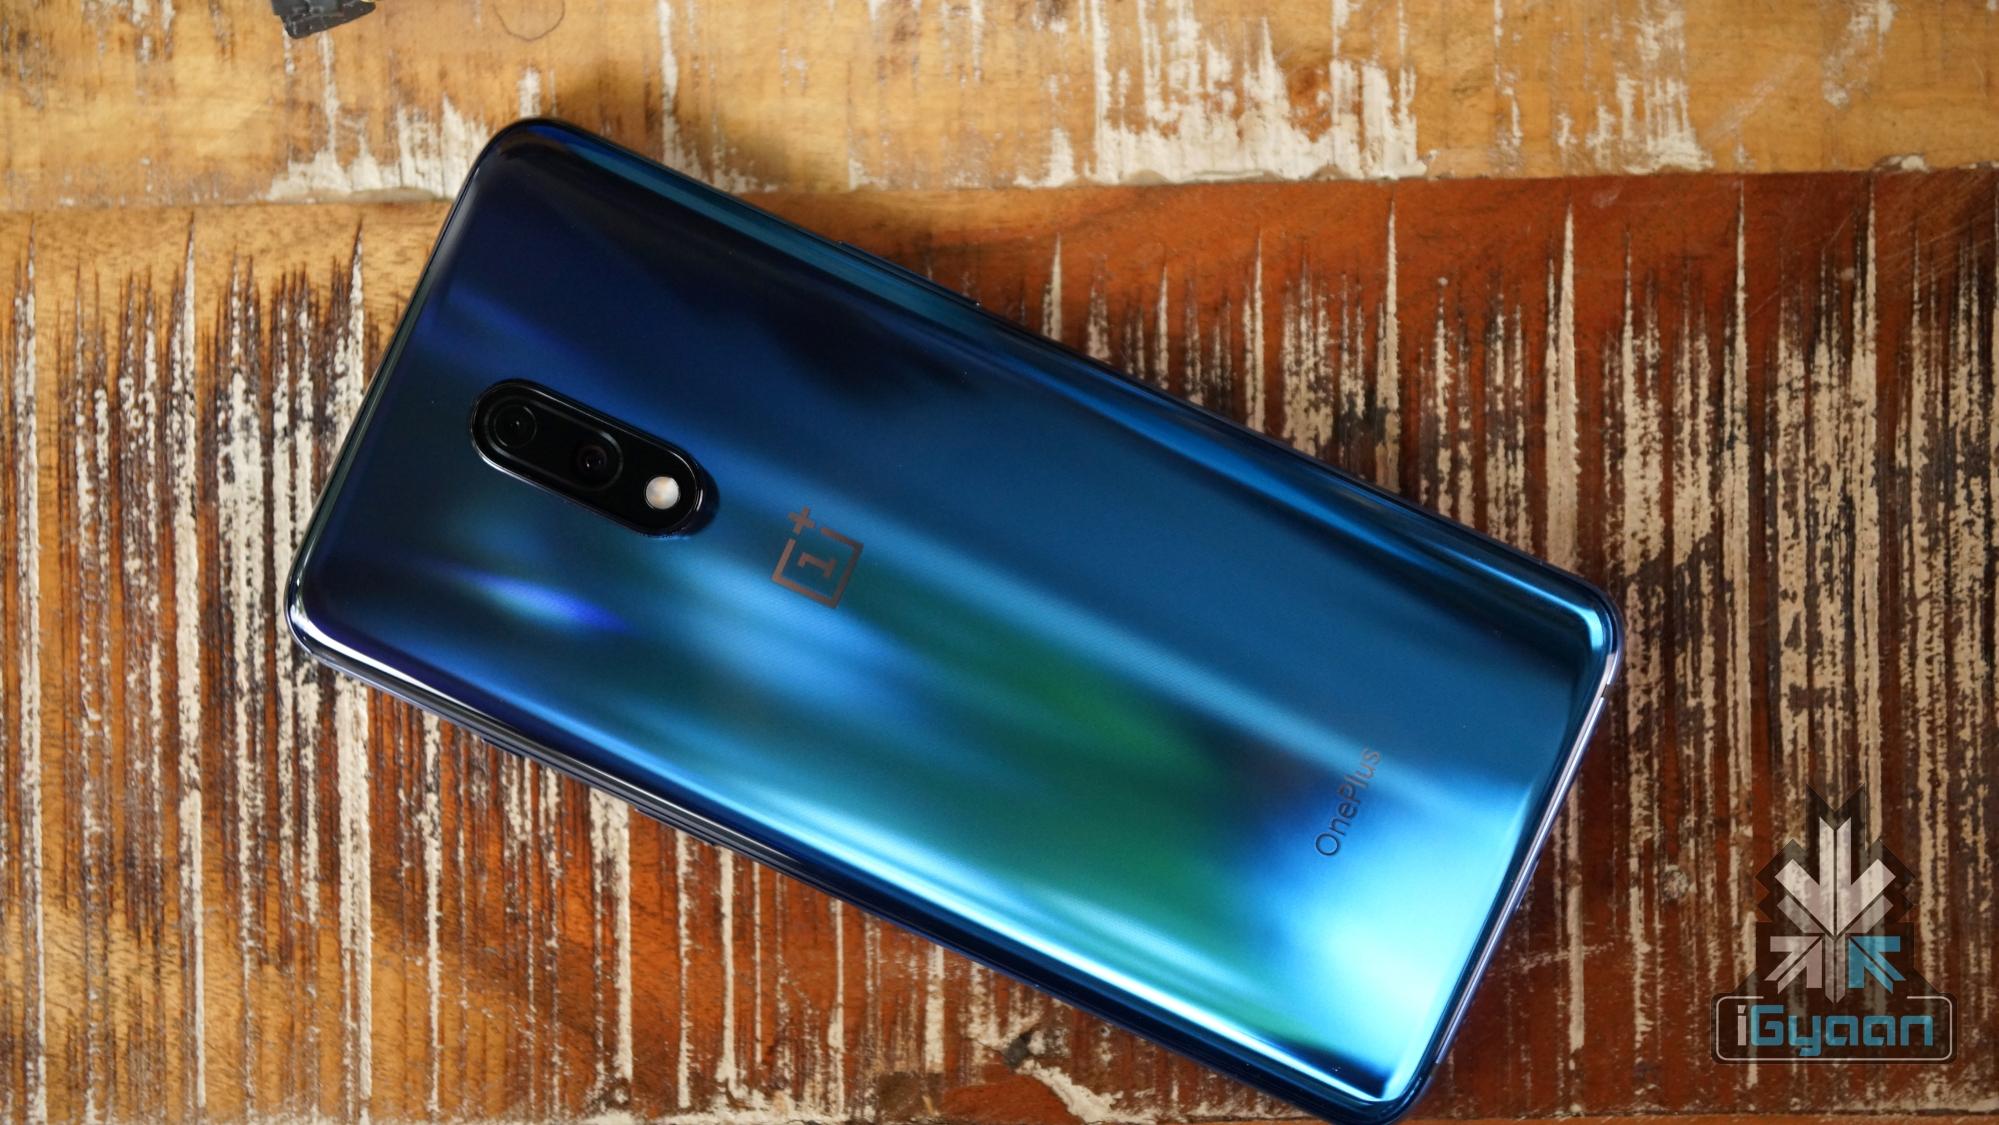 OnePlus 7 Mirror Blue Back